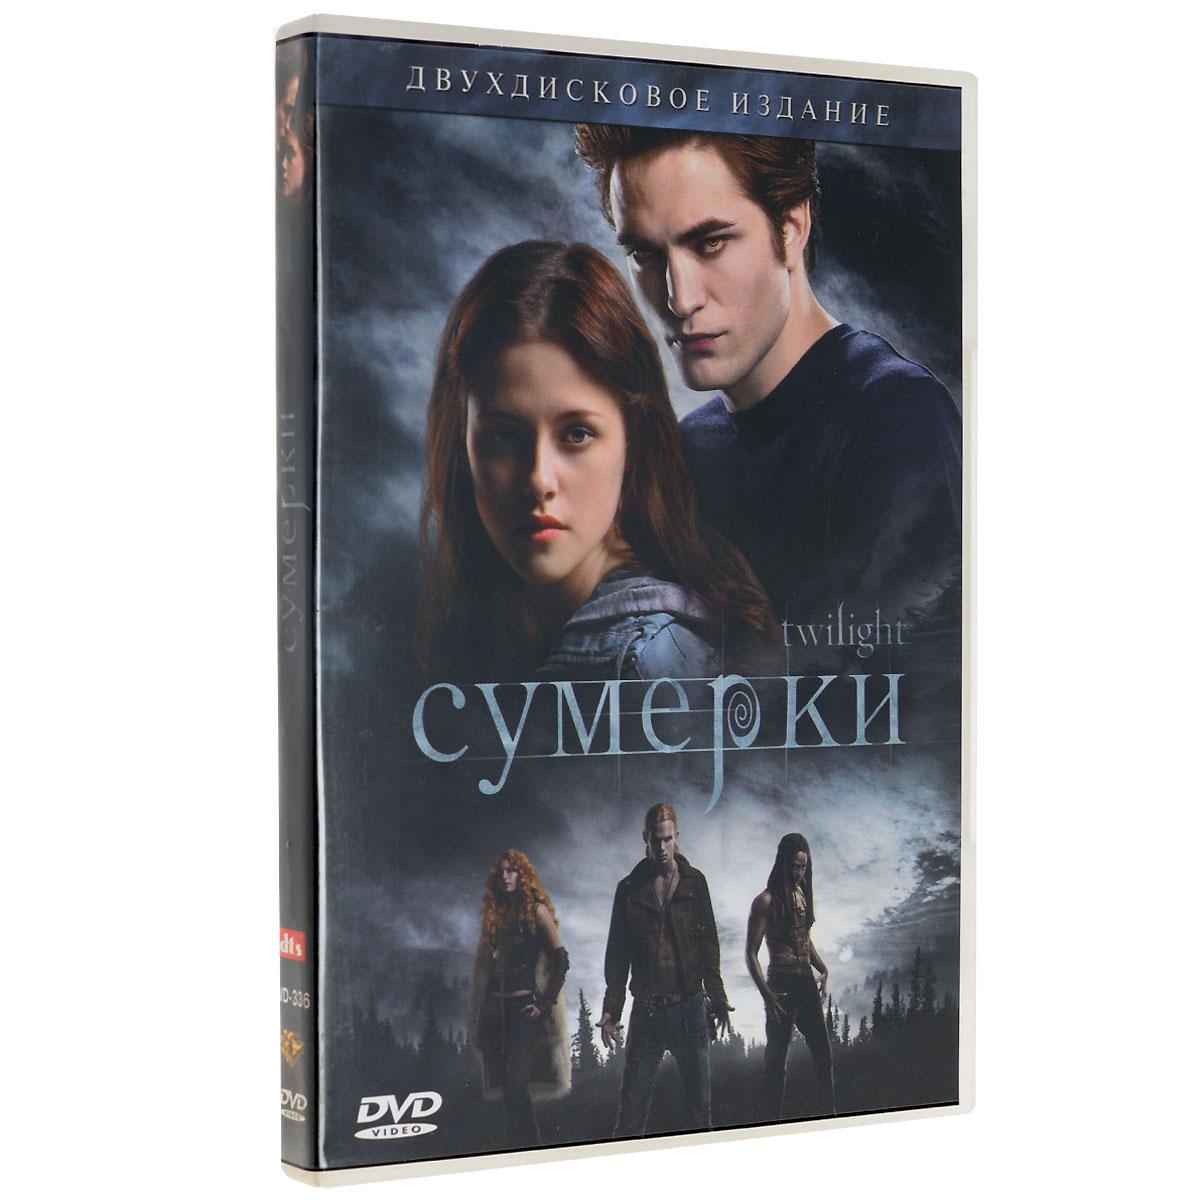 Сумерки (2 DVD)